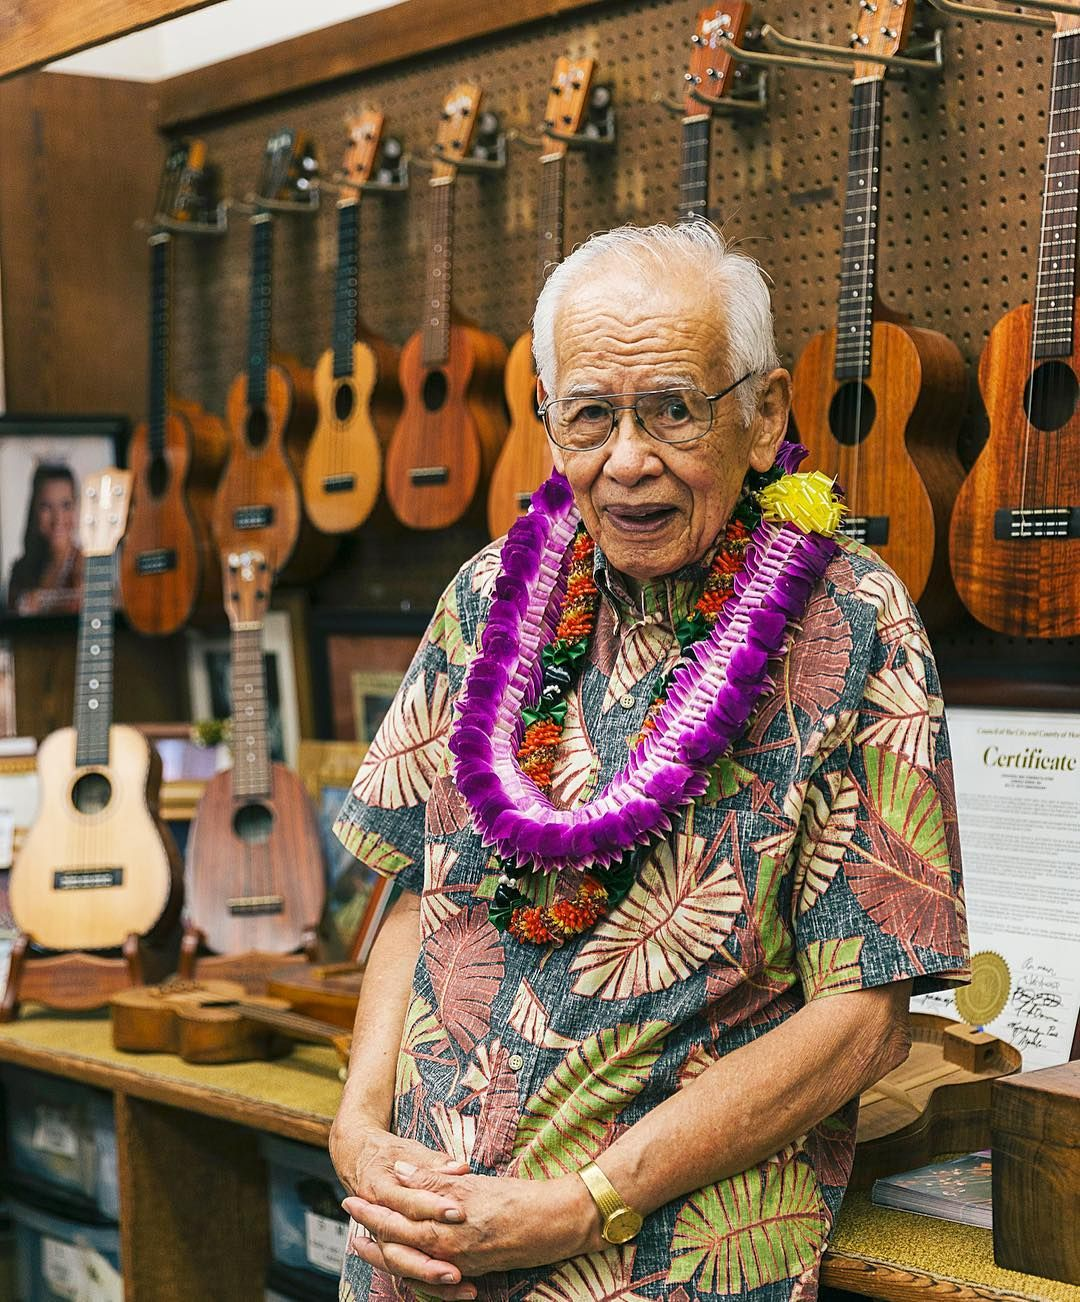 Happy birthday to fred kamaka of kamakaulele he turned 92 explore ukulele happy birthday and more hexwebz Choice Image